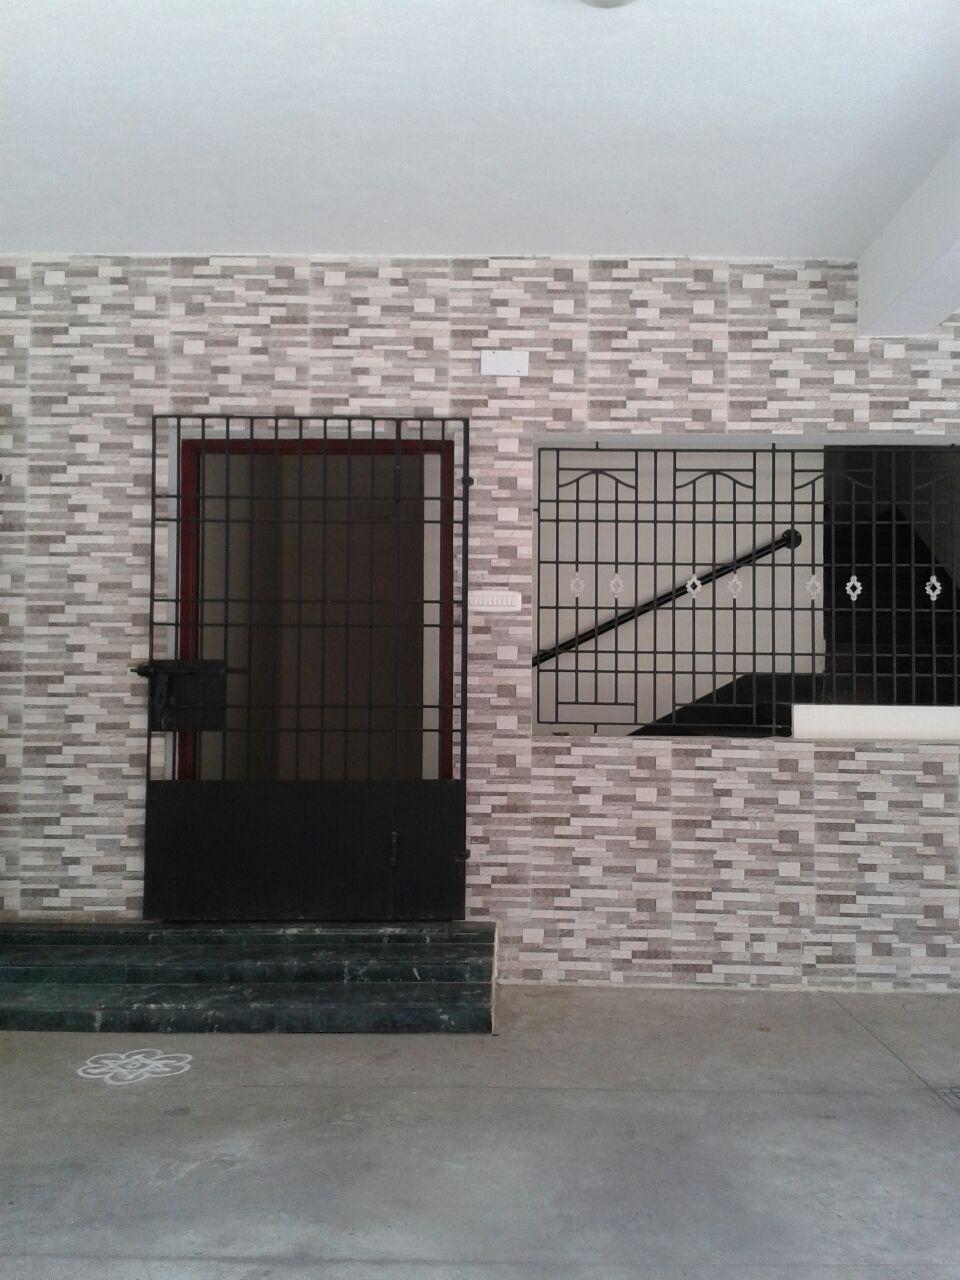 http://360propertymanagement.in/portfolio-item/3-bhk-rangarajapuram-near-5-lights-house-for-rent-in-chennai-2000-sq-ft/